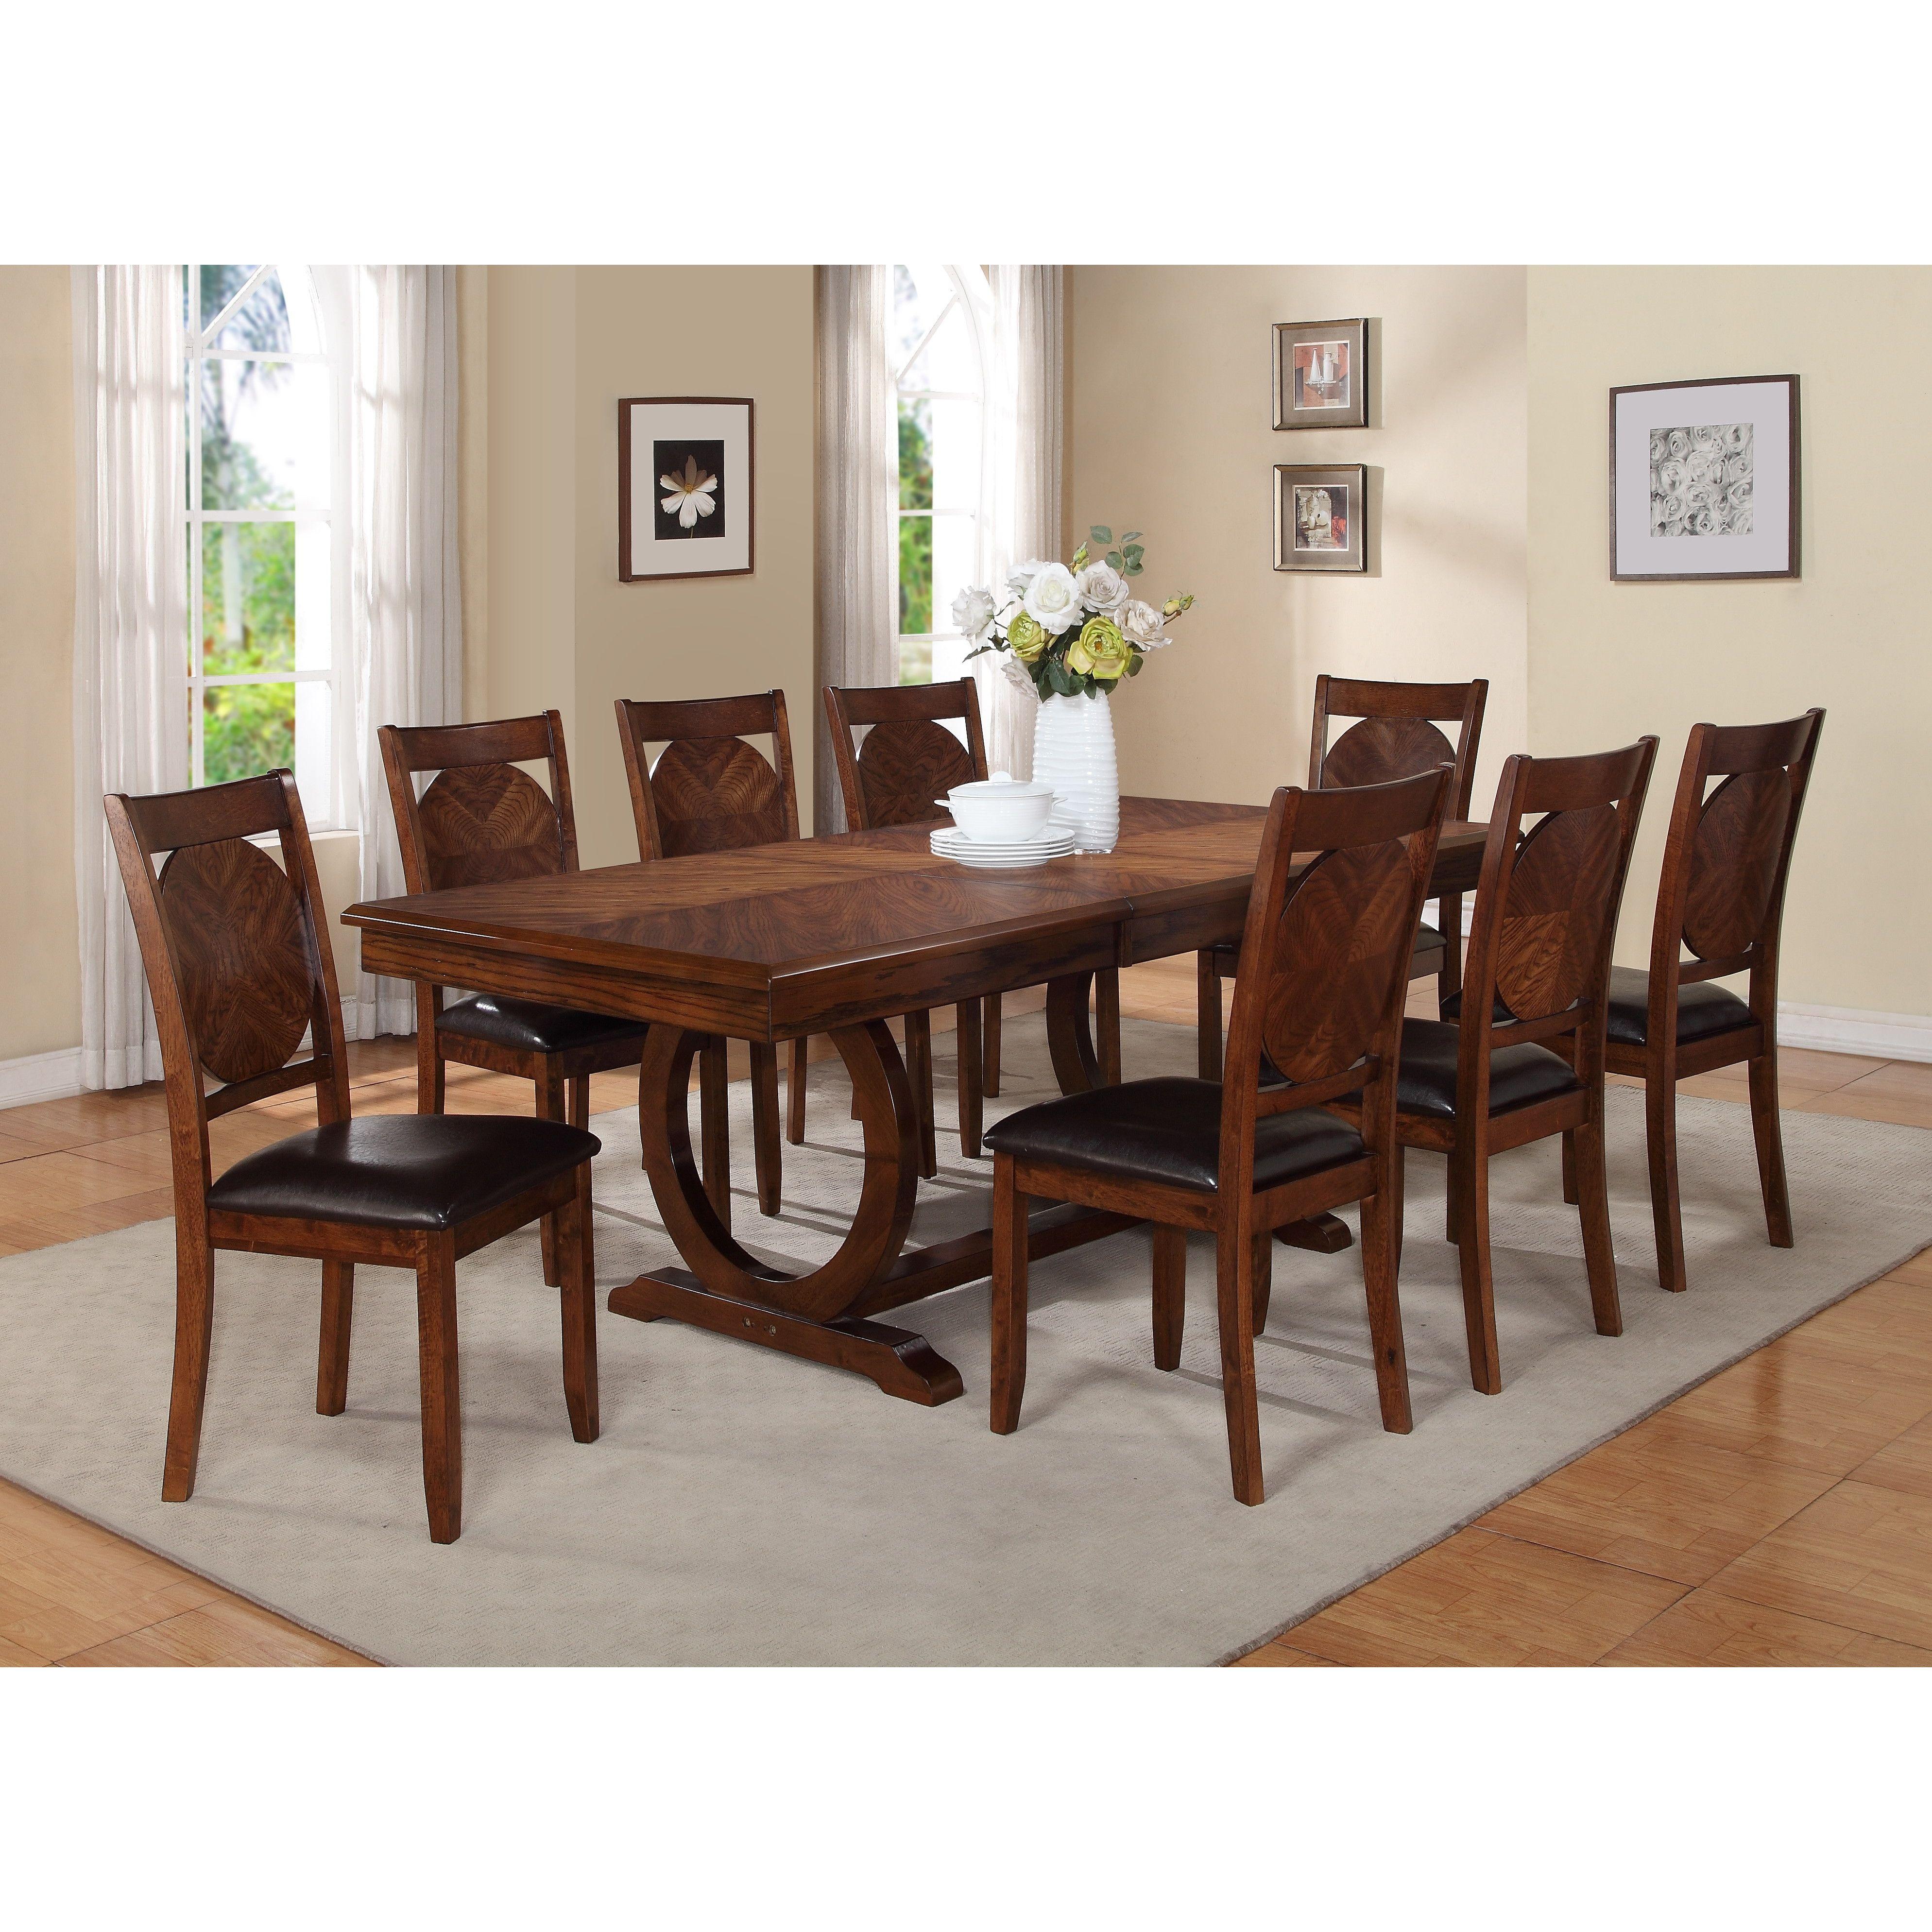 Room · milton green star vernon extendable dining table